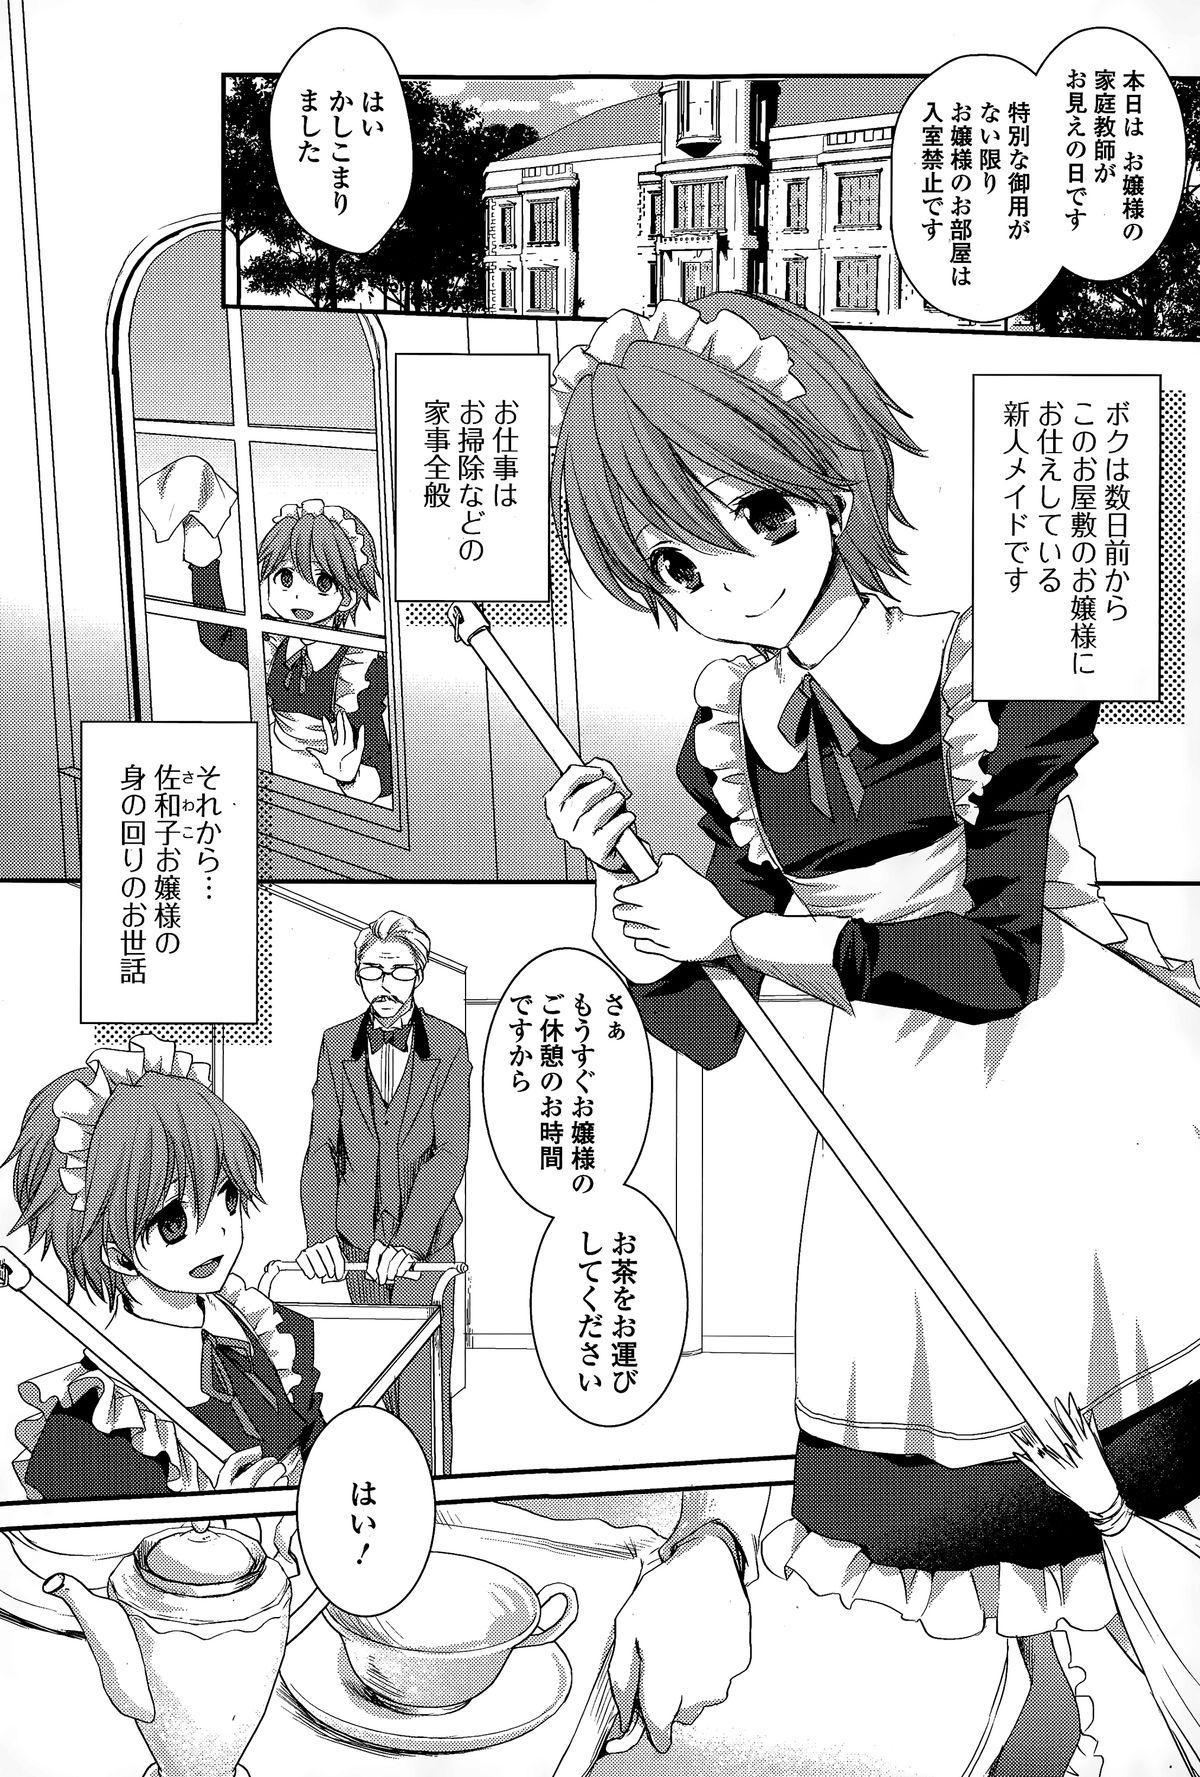 Comic Toutetsu 2015-02 Vol. 3 189